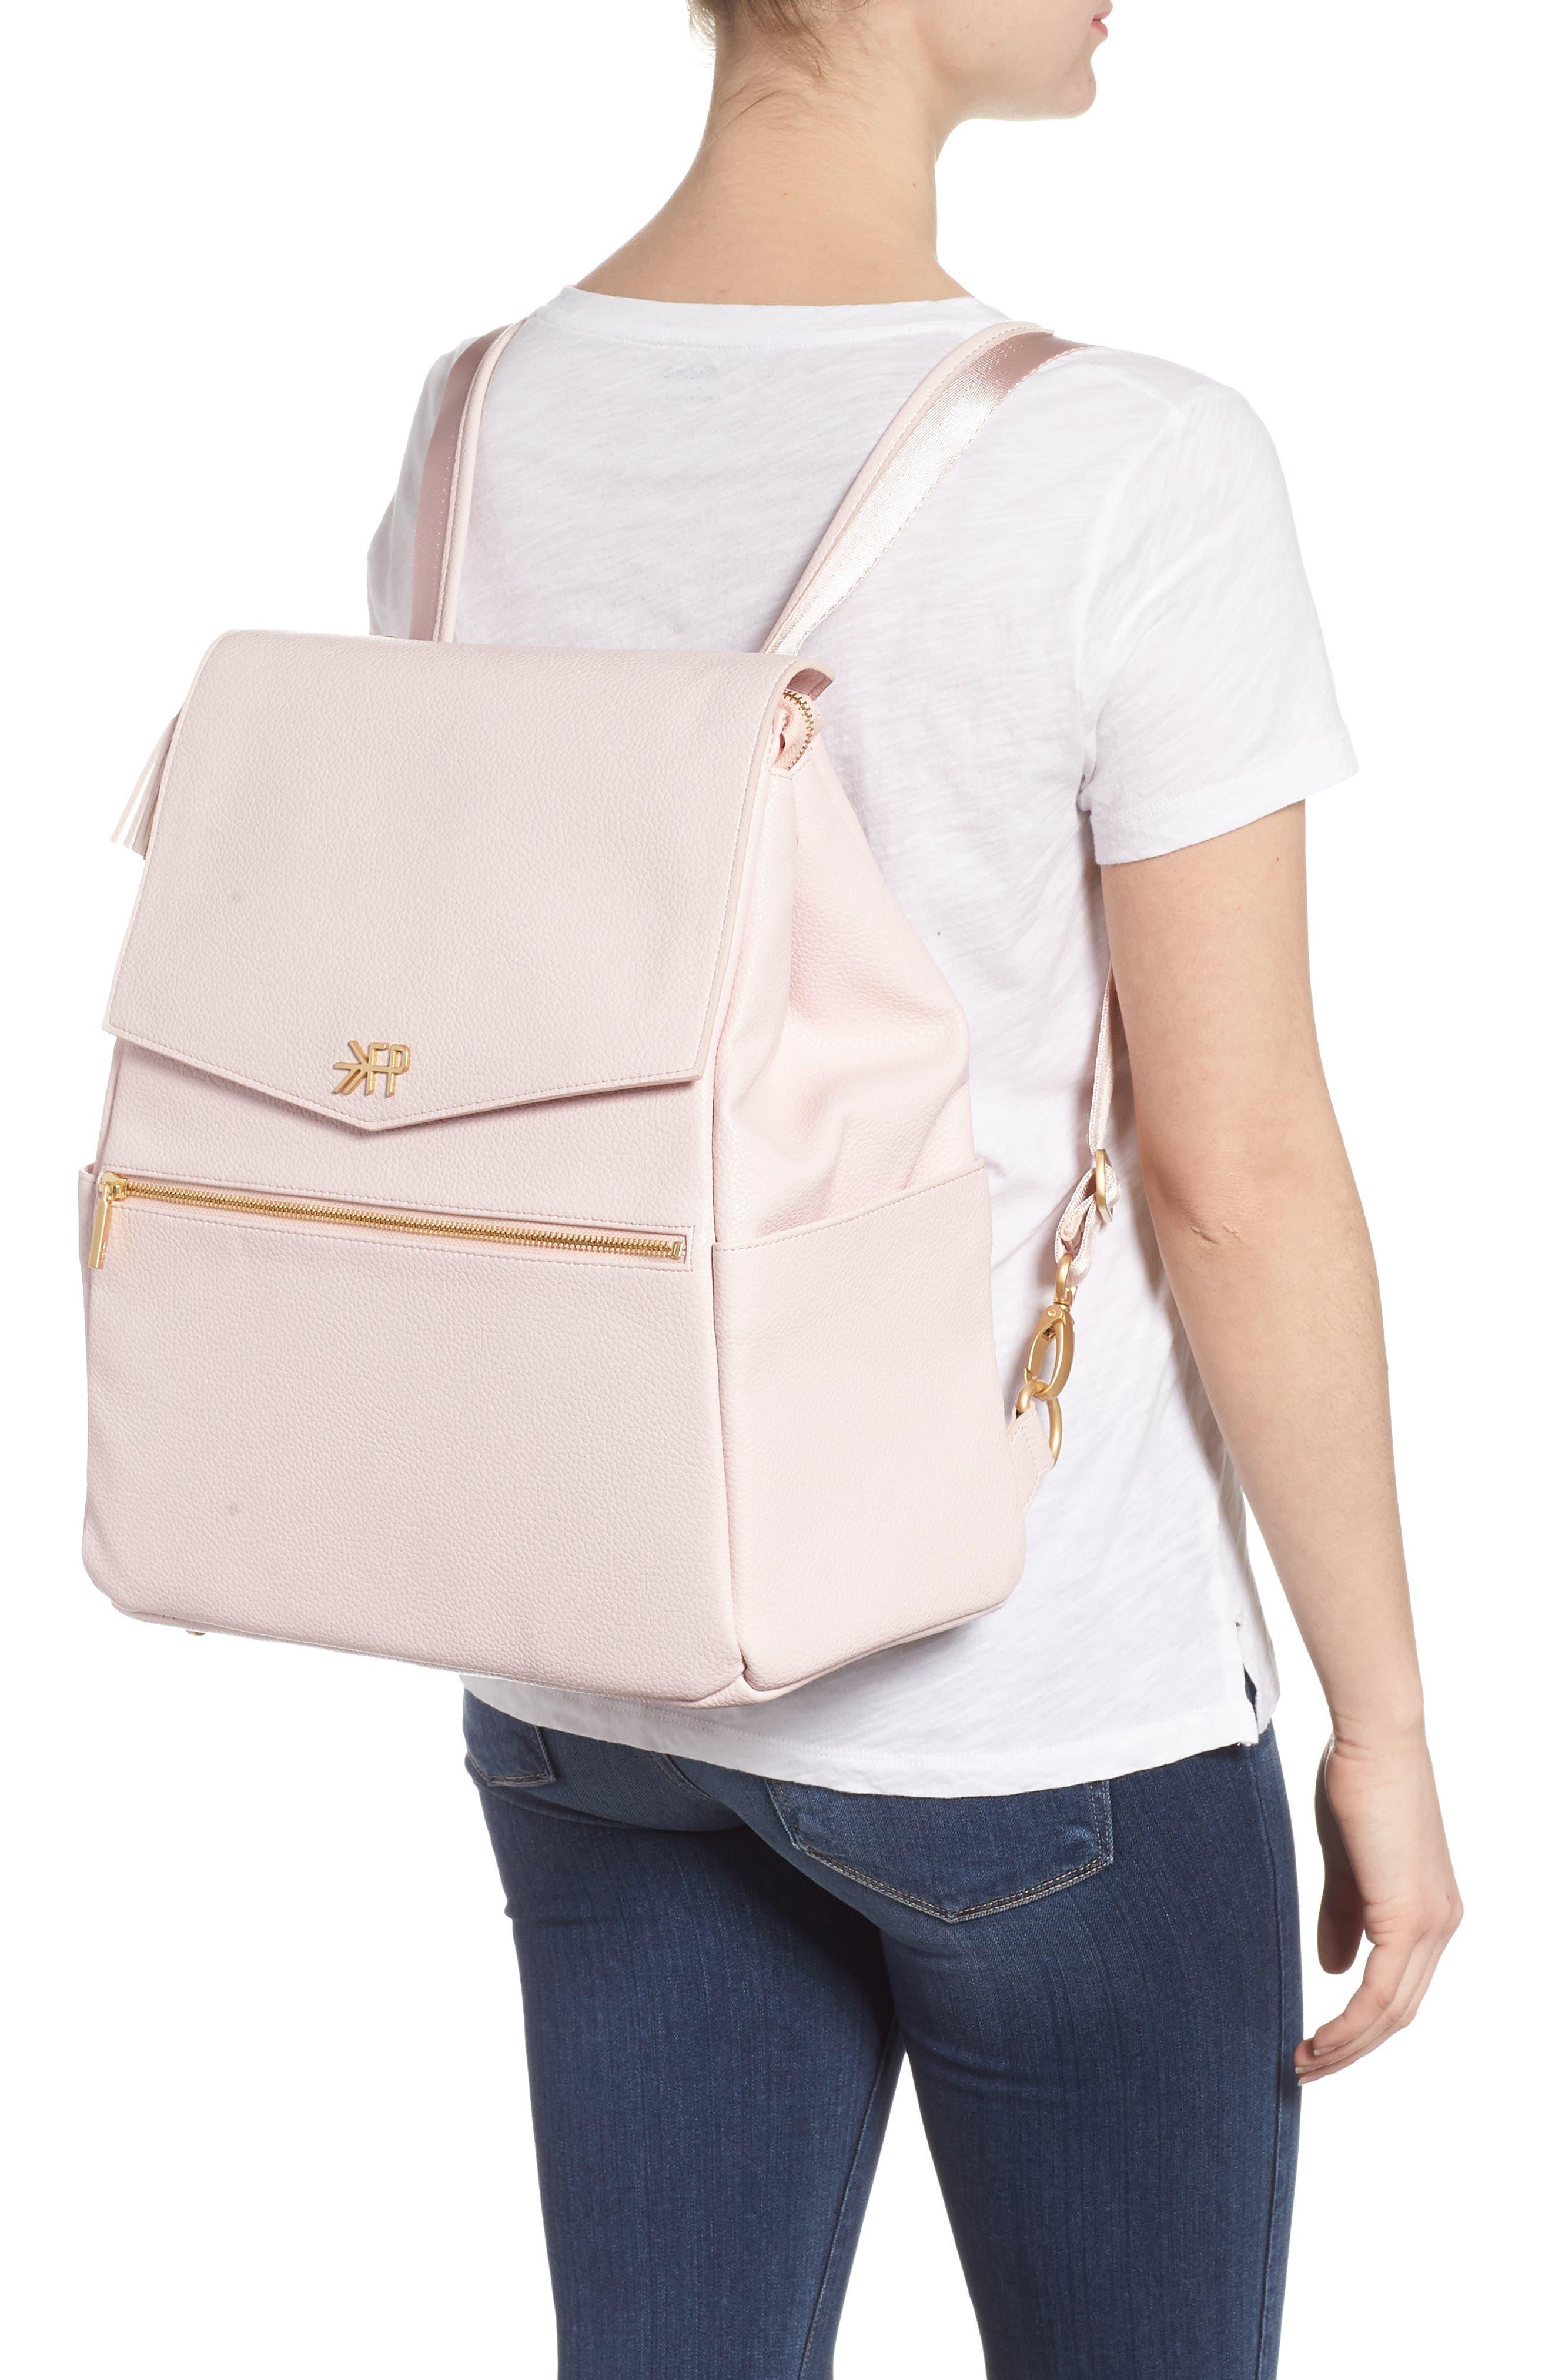 Convertible Diaper Backpack,                             Alternate thumbnail 12, color,